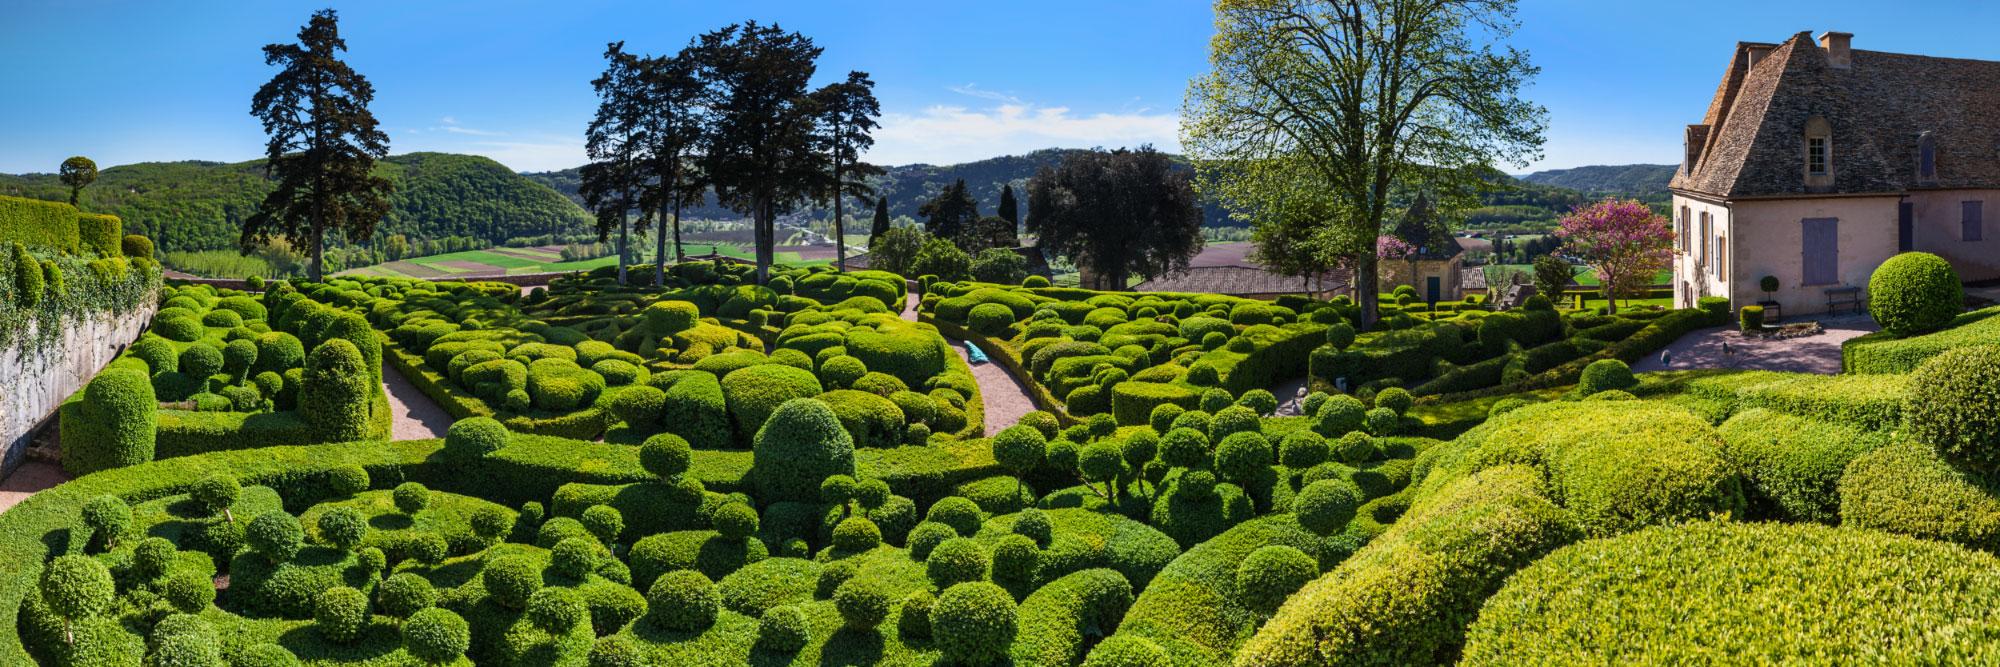 Dordogne Les Jardins De Marqueyssac